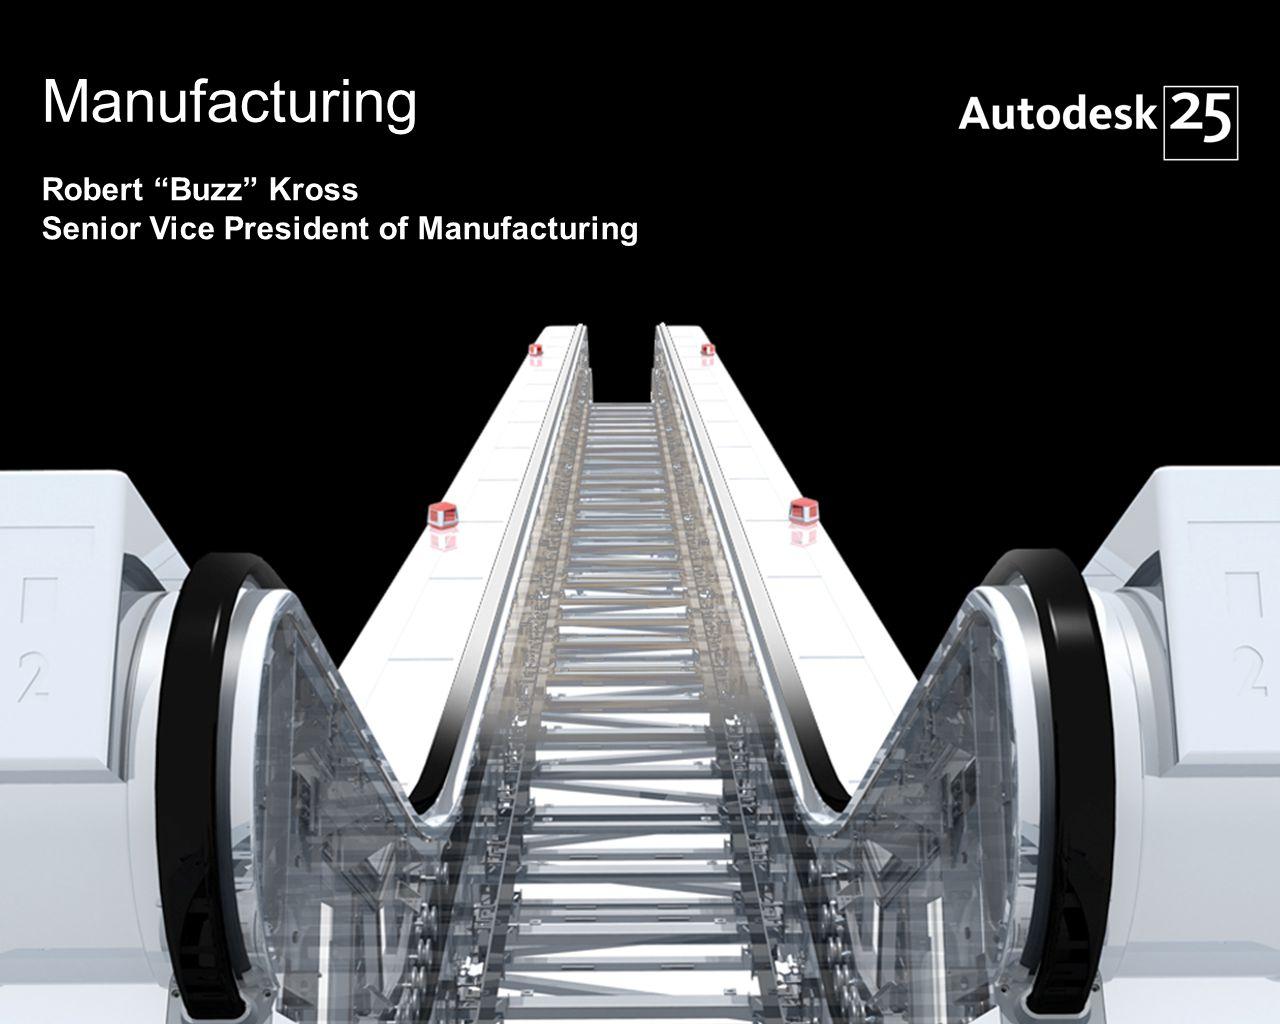 32© 2007 Autodesk Digital Prototyping Unique competitive advantage Growth engine for 3D business Significant future potential